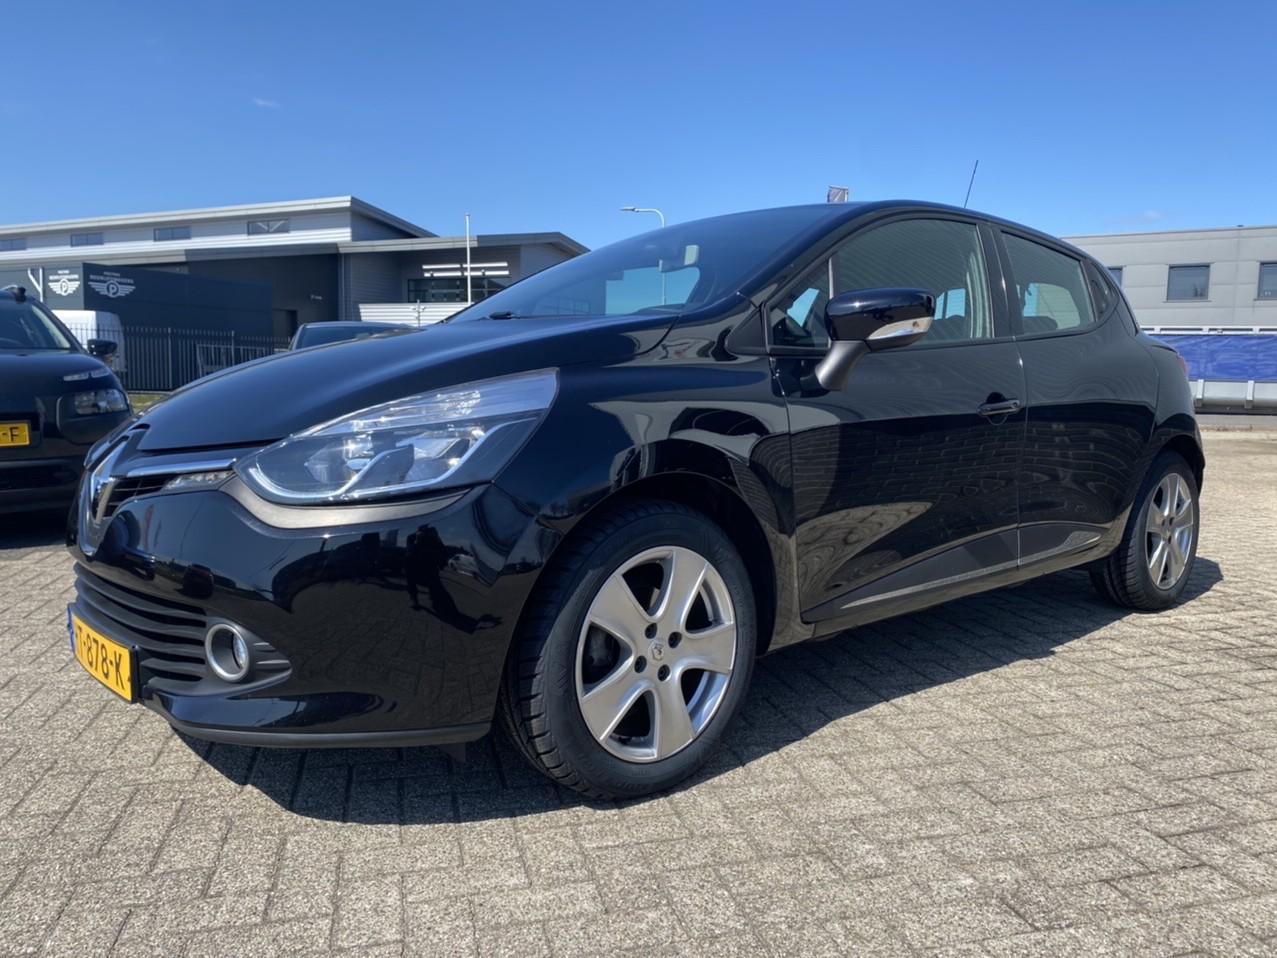 Renault Clio Dynamique 90 pk rijklaar prijs